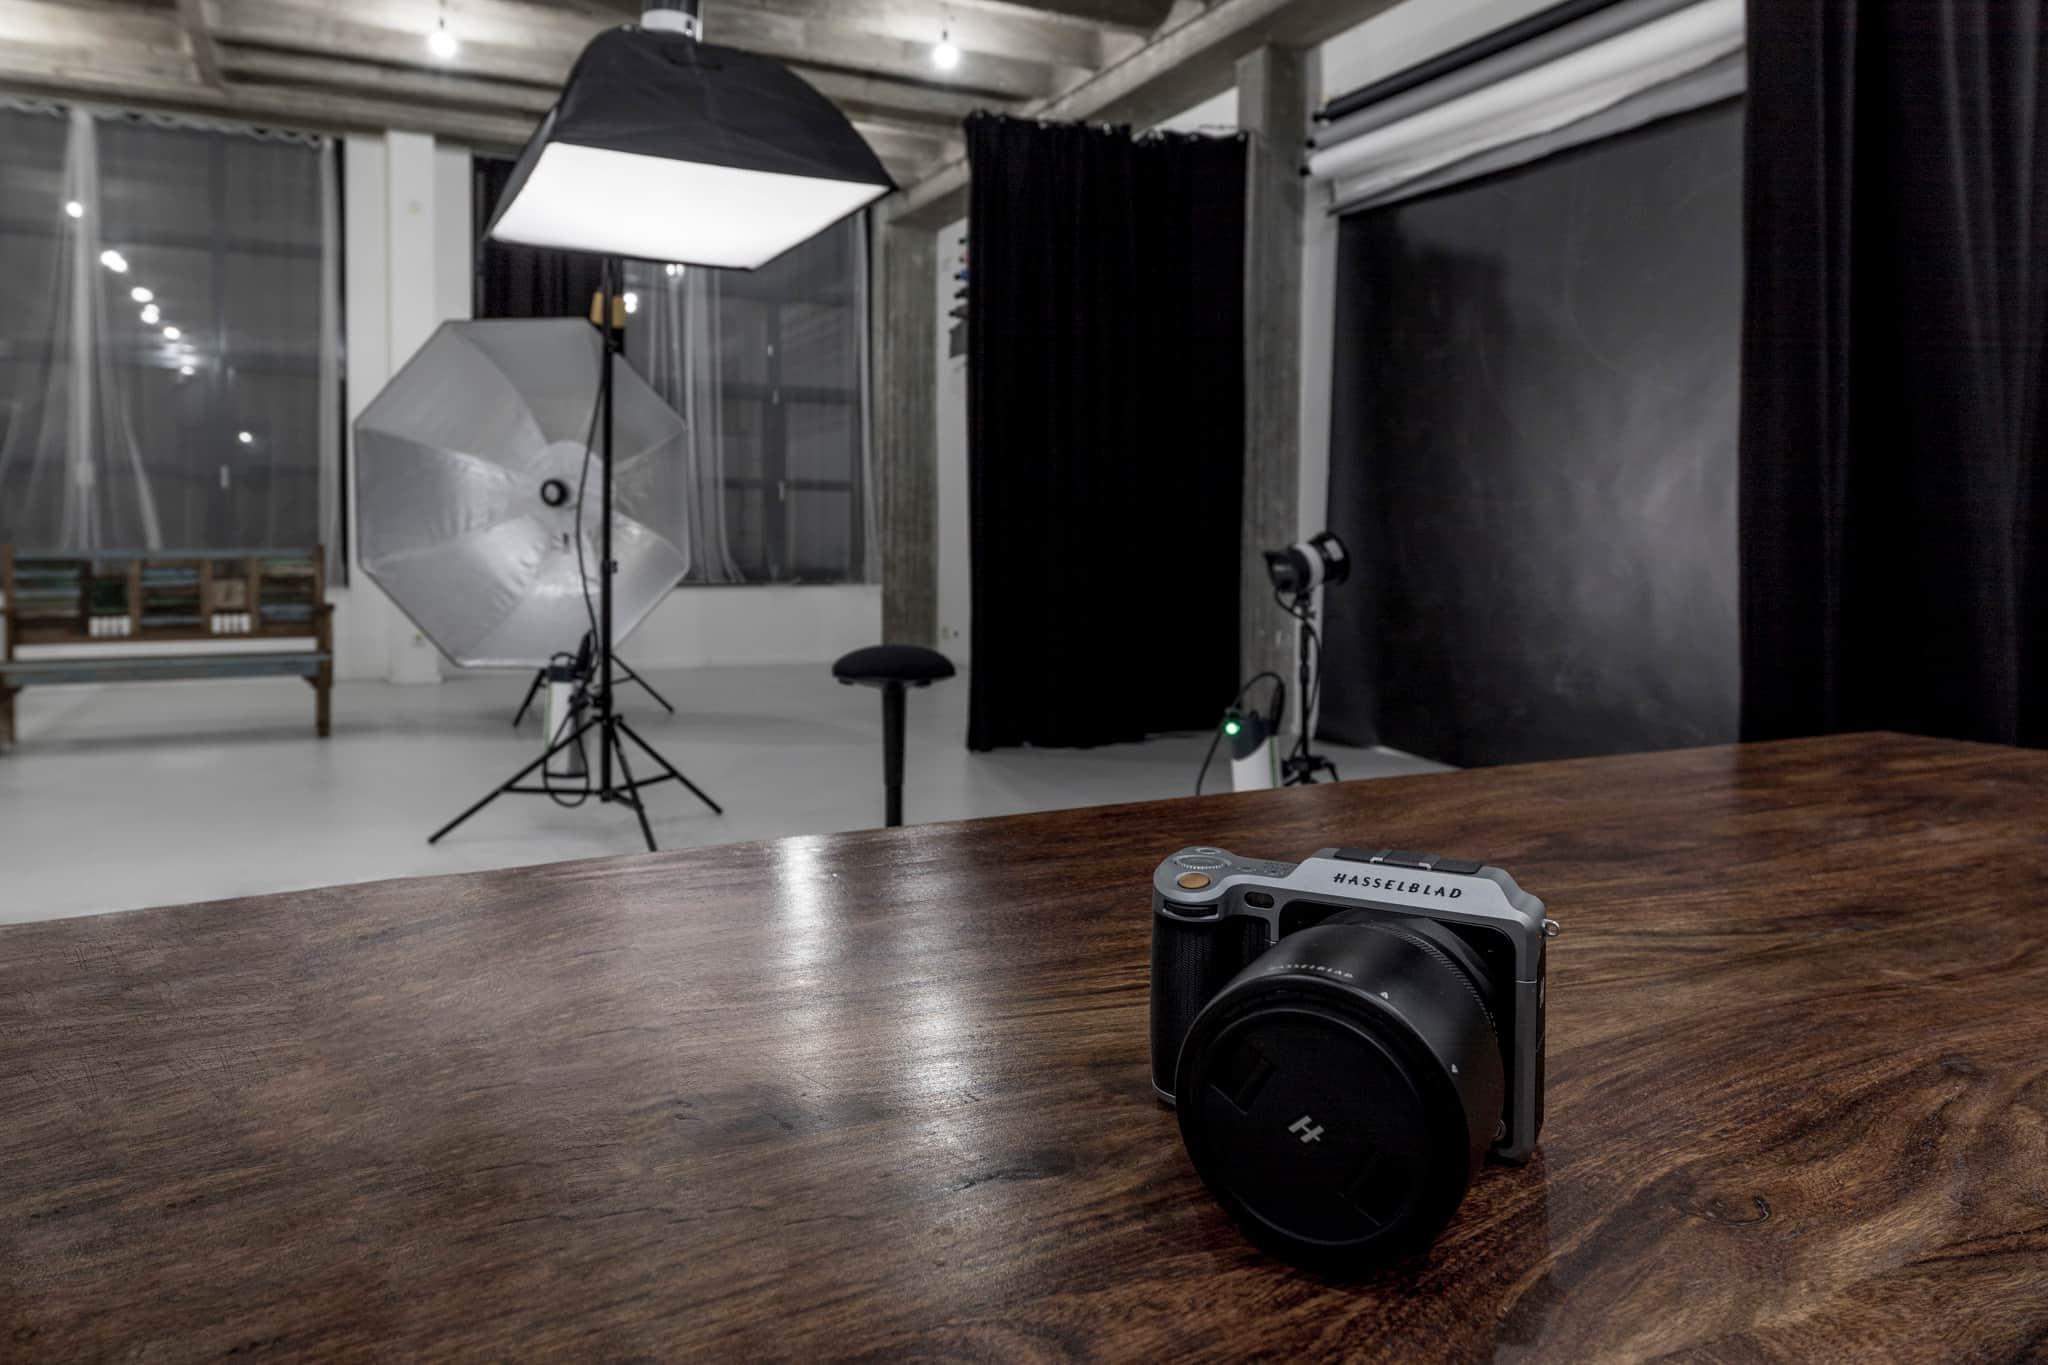 Fotostudio Studio-X1 Detailaufnahme Mittelformat Kamera Hasselblad X1D Fotografie Foto Darmstadt Odenwald Gross-Bieberau Groß-Bieberau alte möbelfabrik